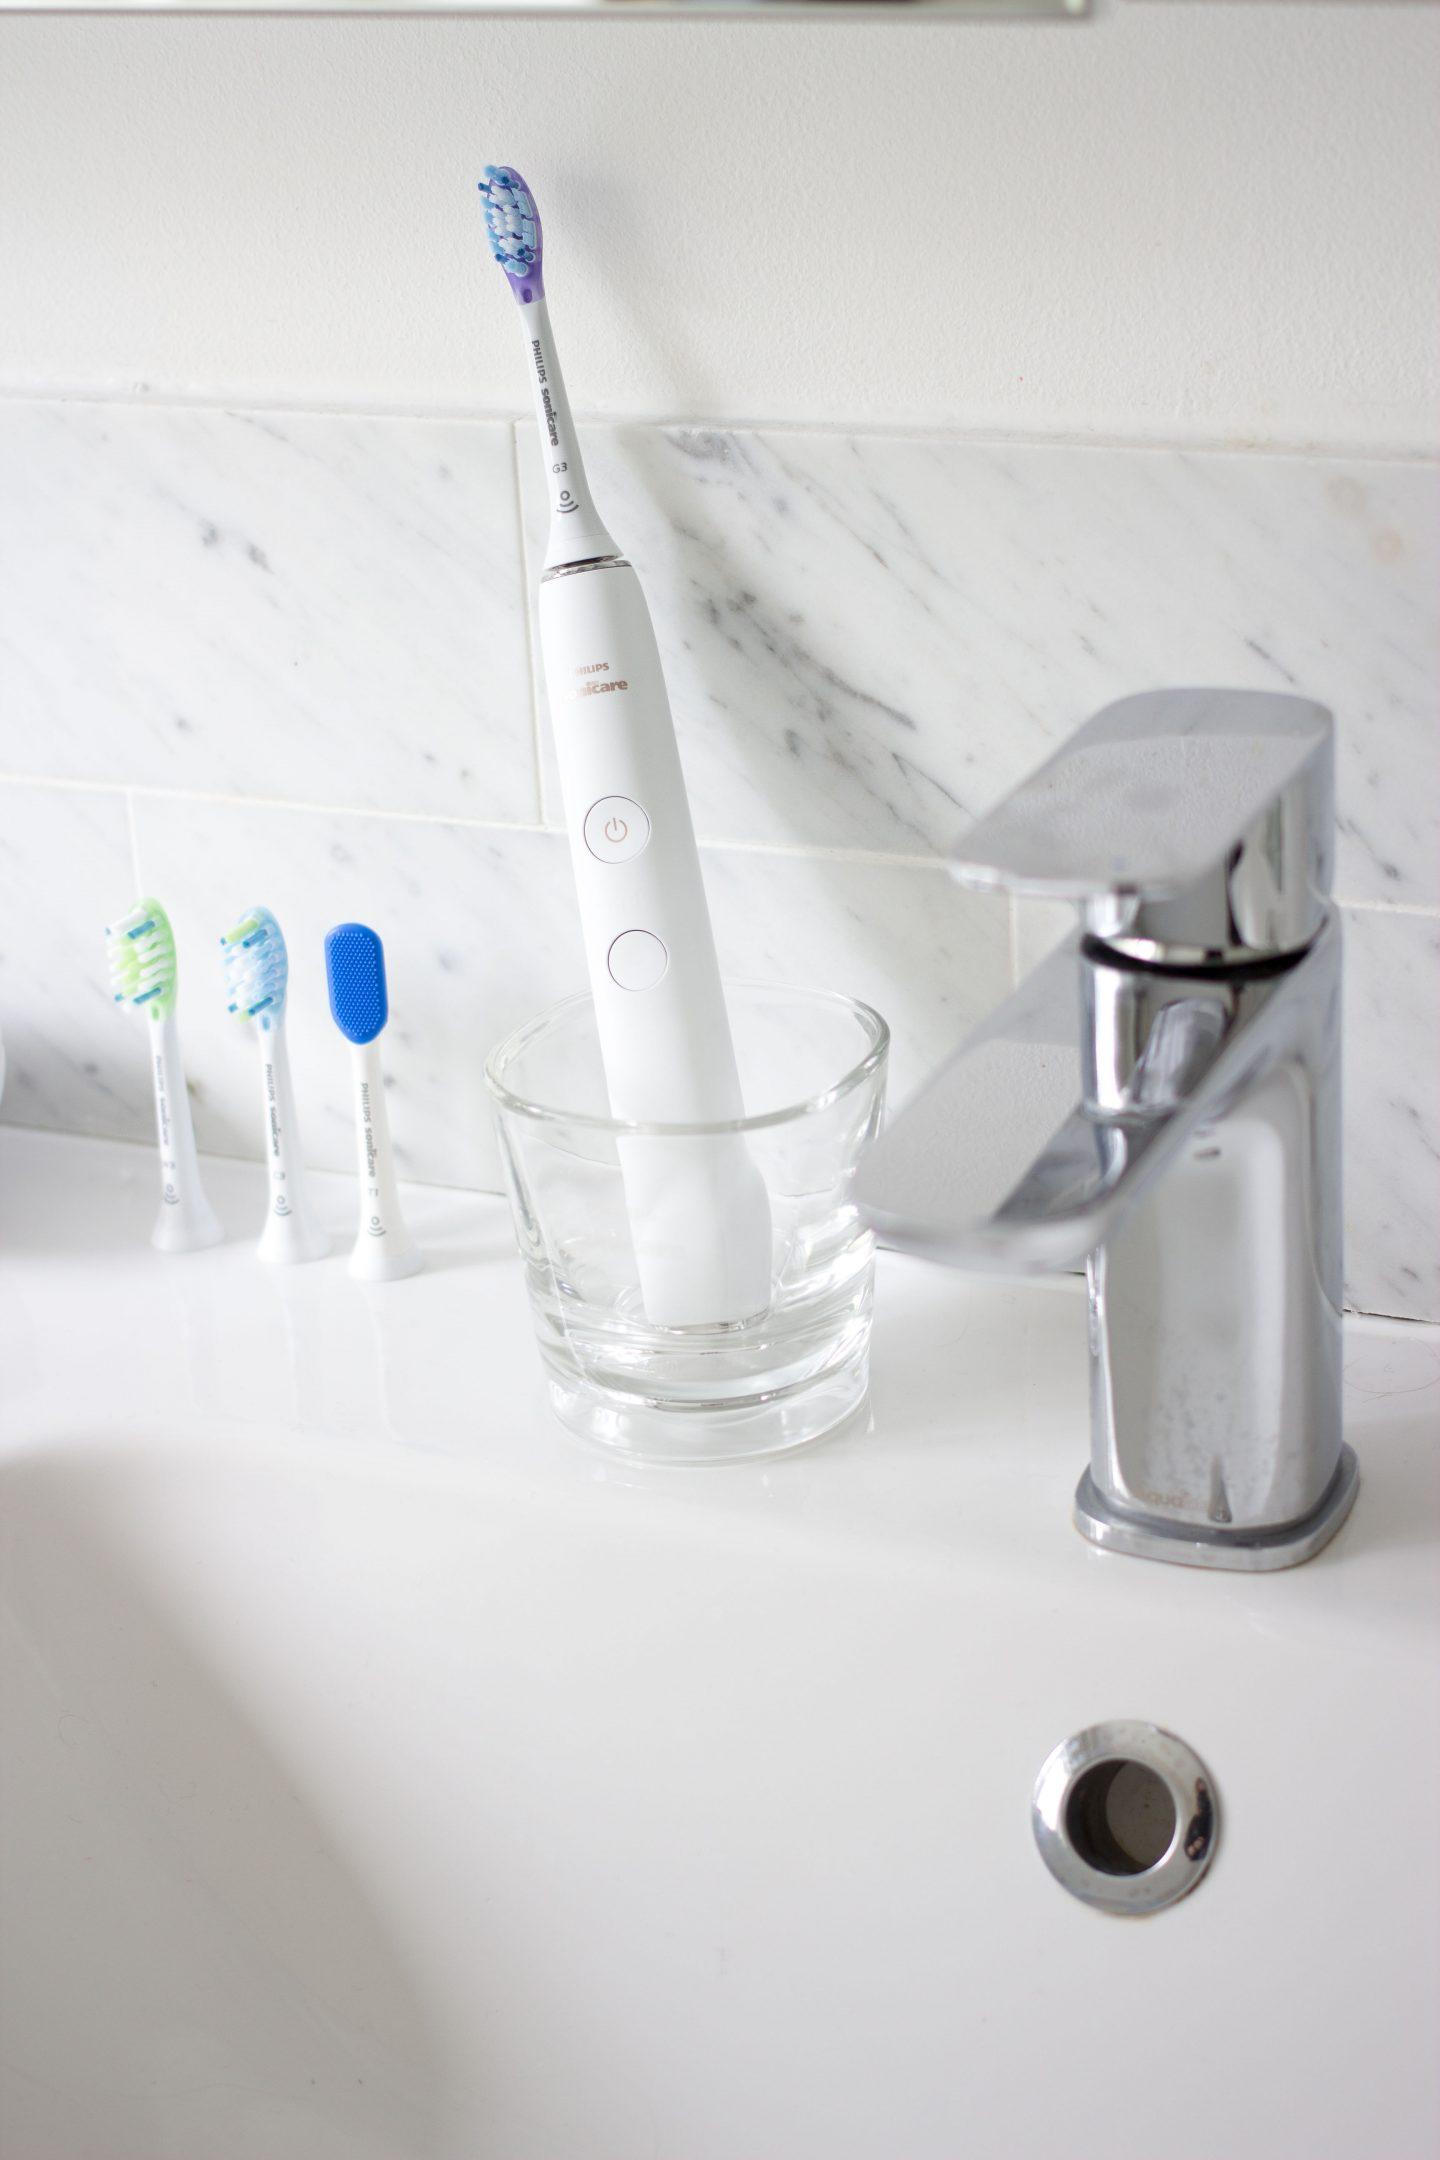 Phillips sonicare diamond clean smart-2